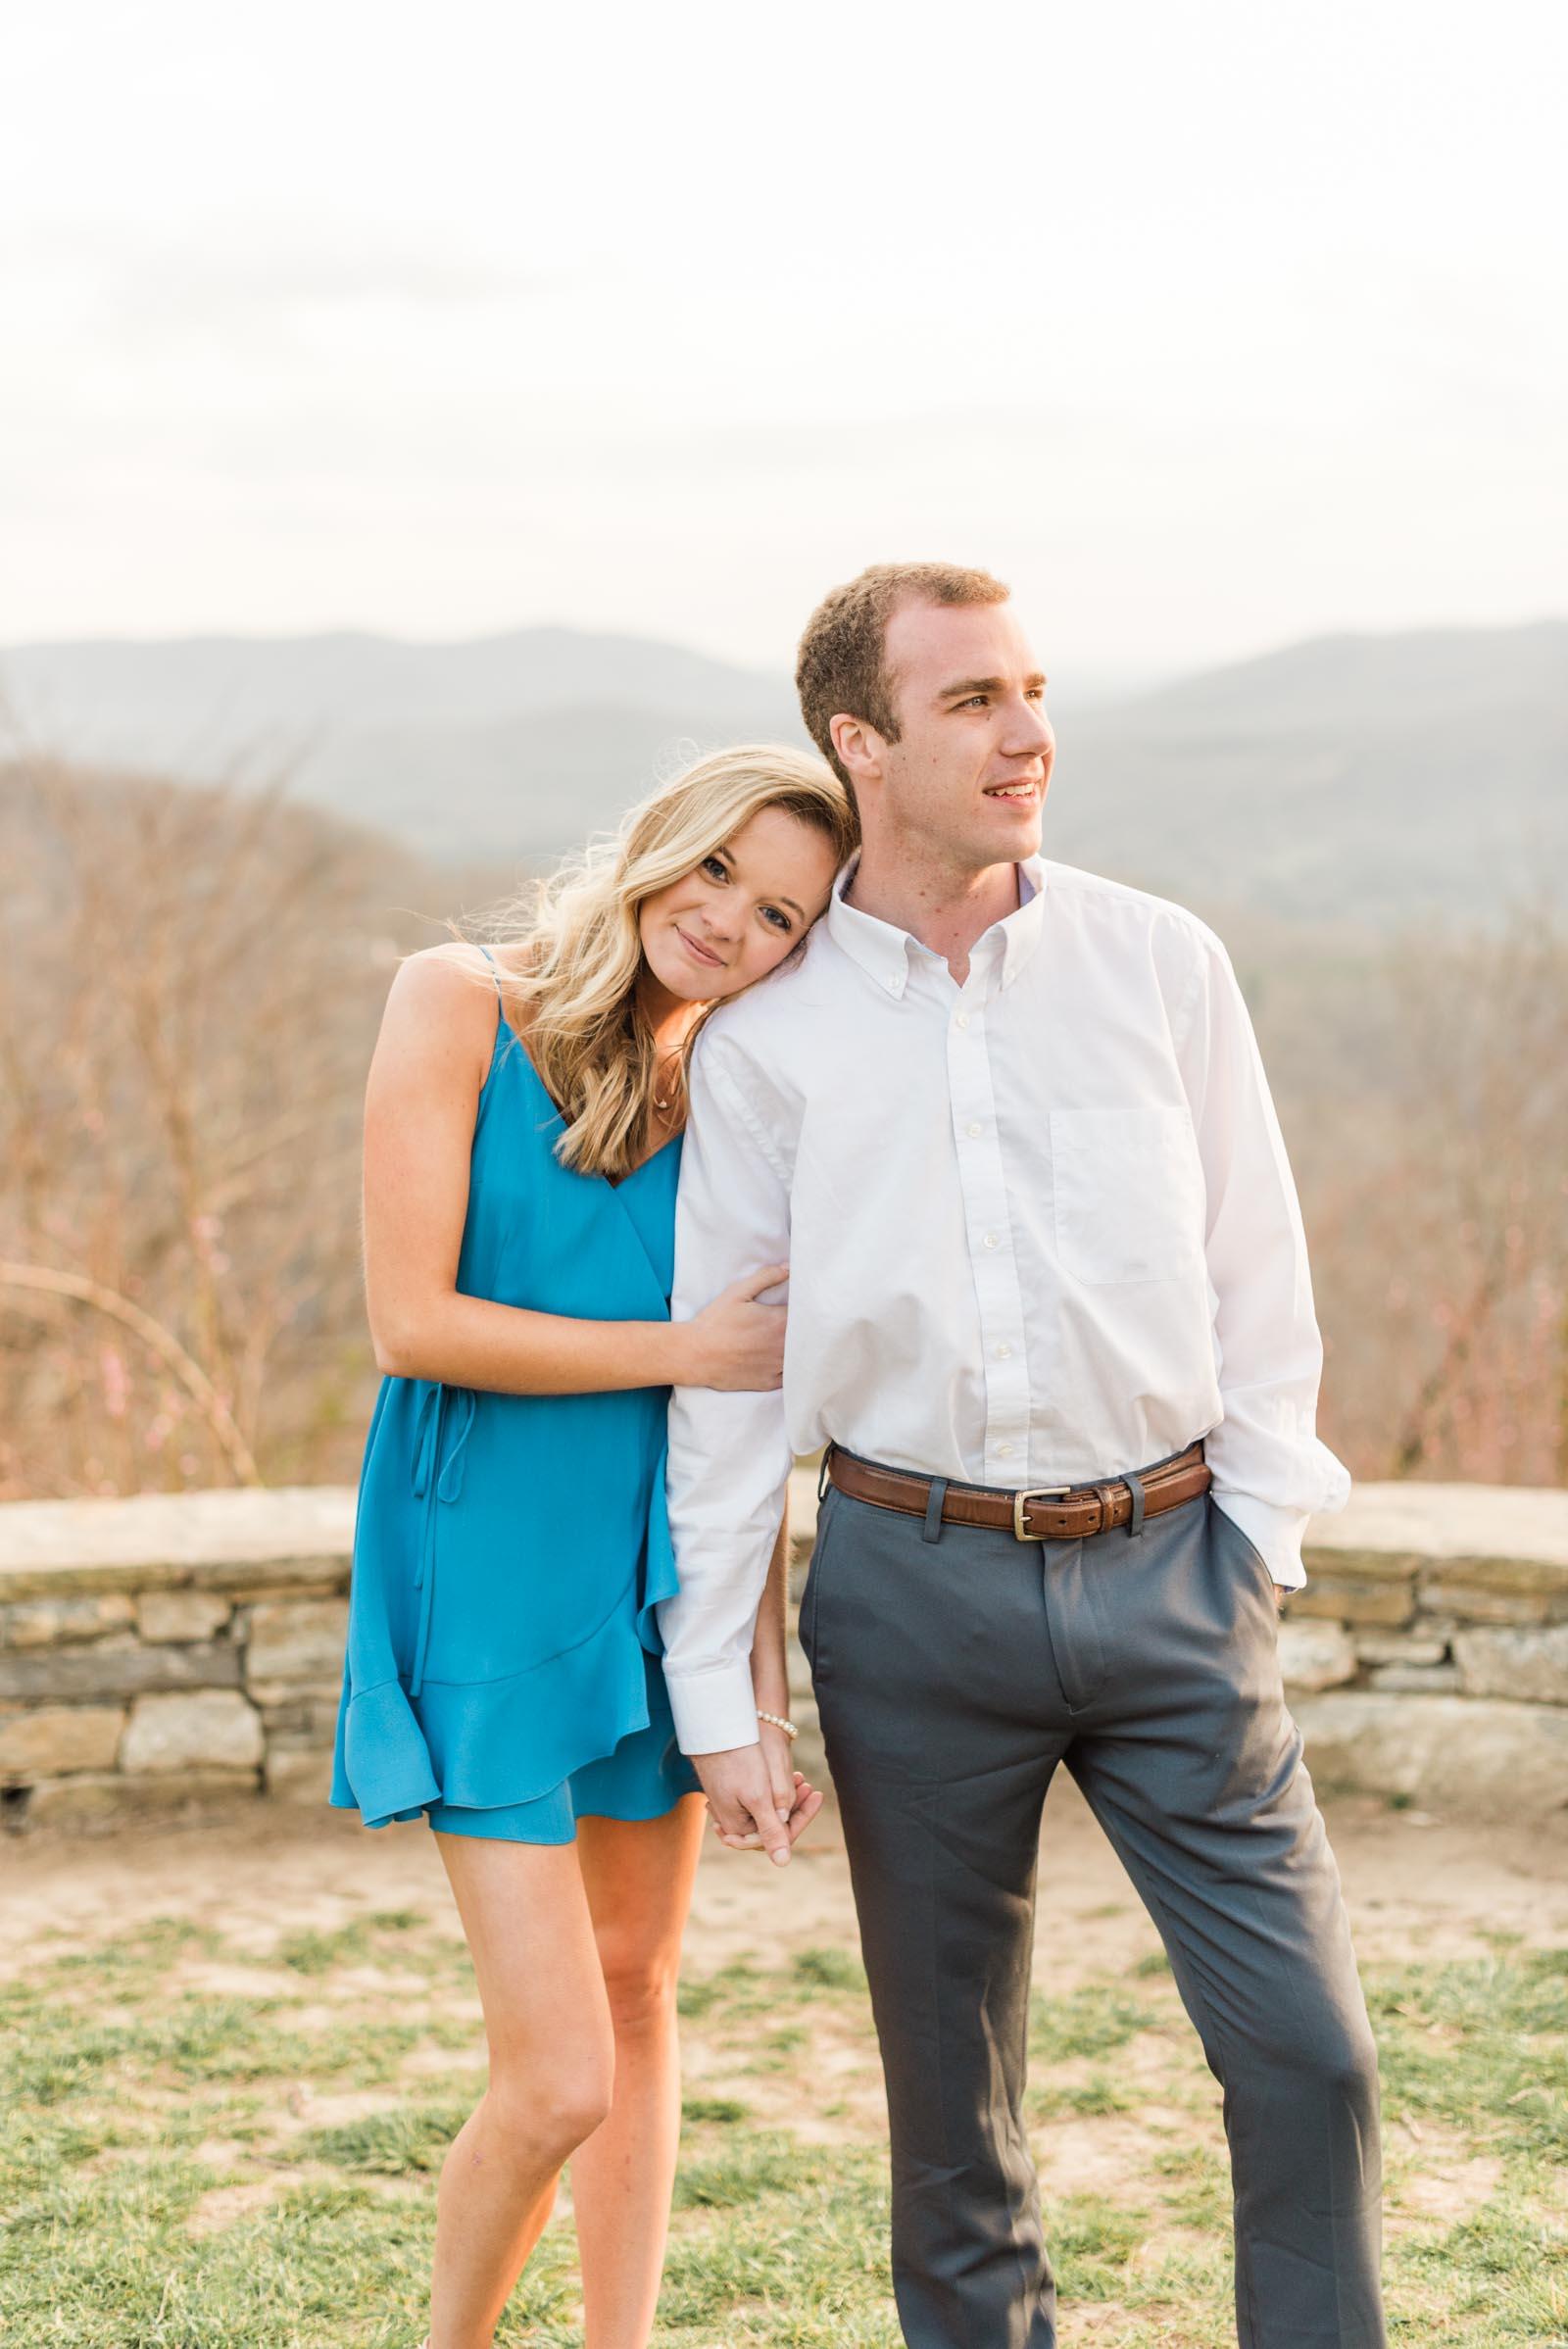 Sunset Mountain Engagement in North Carolina Morgan & Nathan Markie Walden Photography-14.jpg